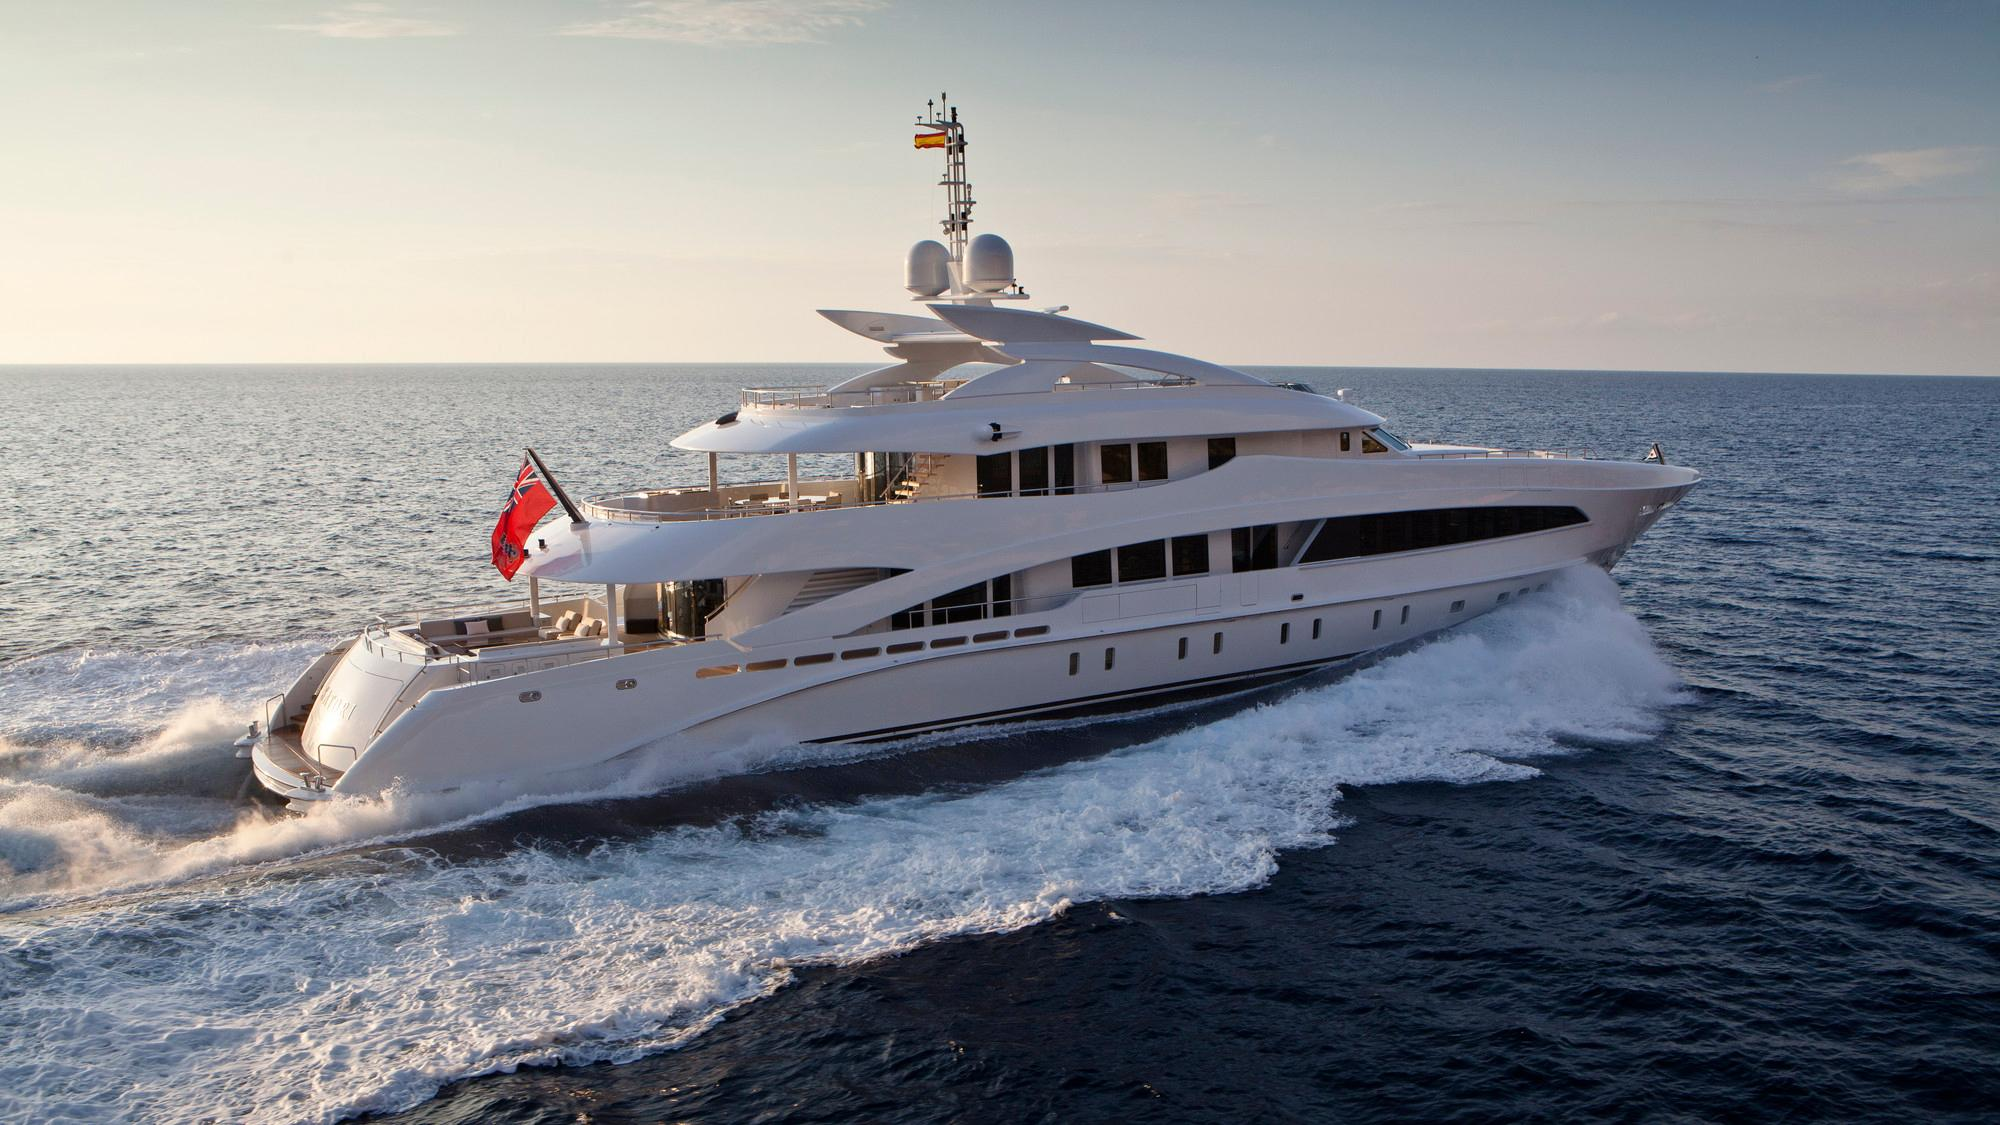 septimus-motor-yacht-heesen-2011-50m-cruising-half-profile-stern